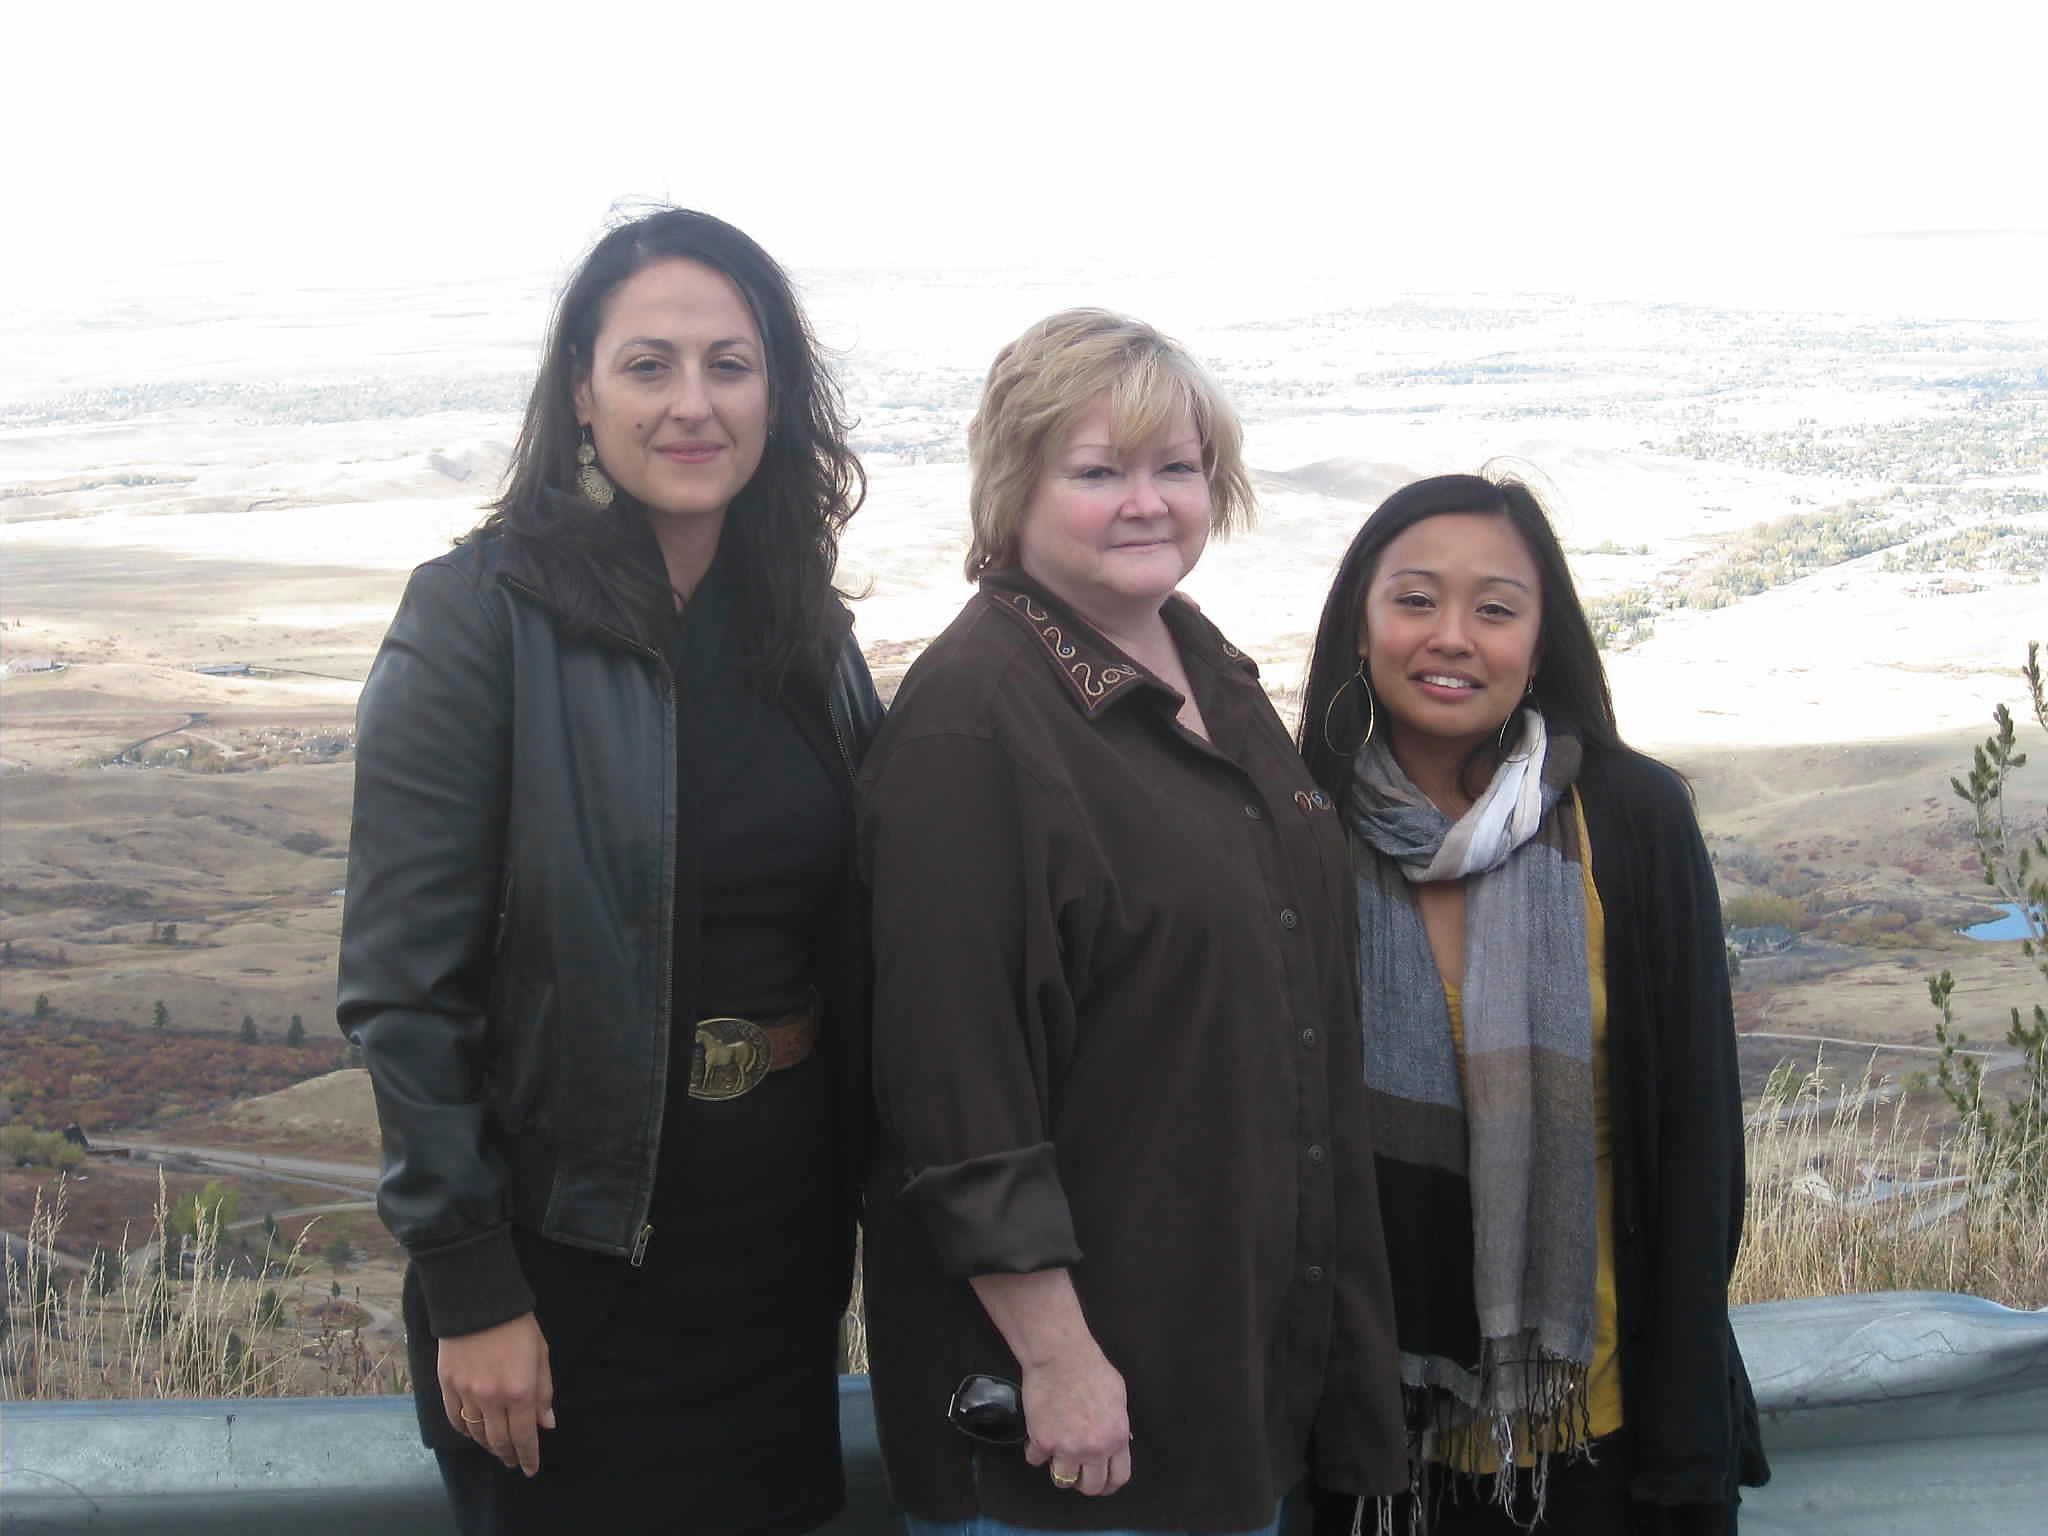 """Matt Shepard is a Friend of Mine"" co-producer Zeina Barkawi (left), Matthew Shepard's mother Judy, and Michele filming in Matt's hometown of Casper, Wyoming."